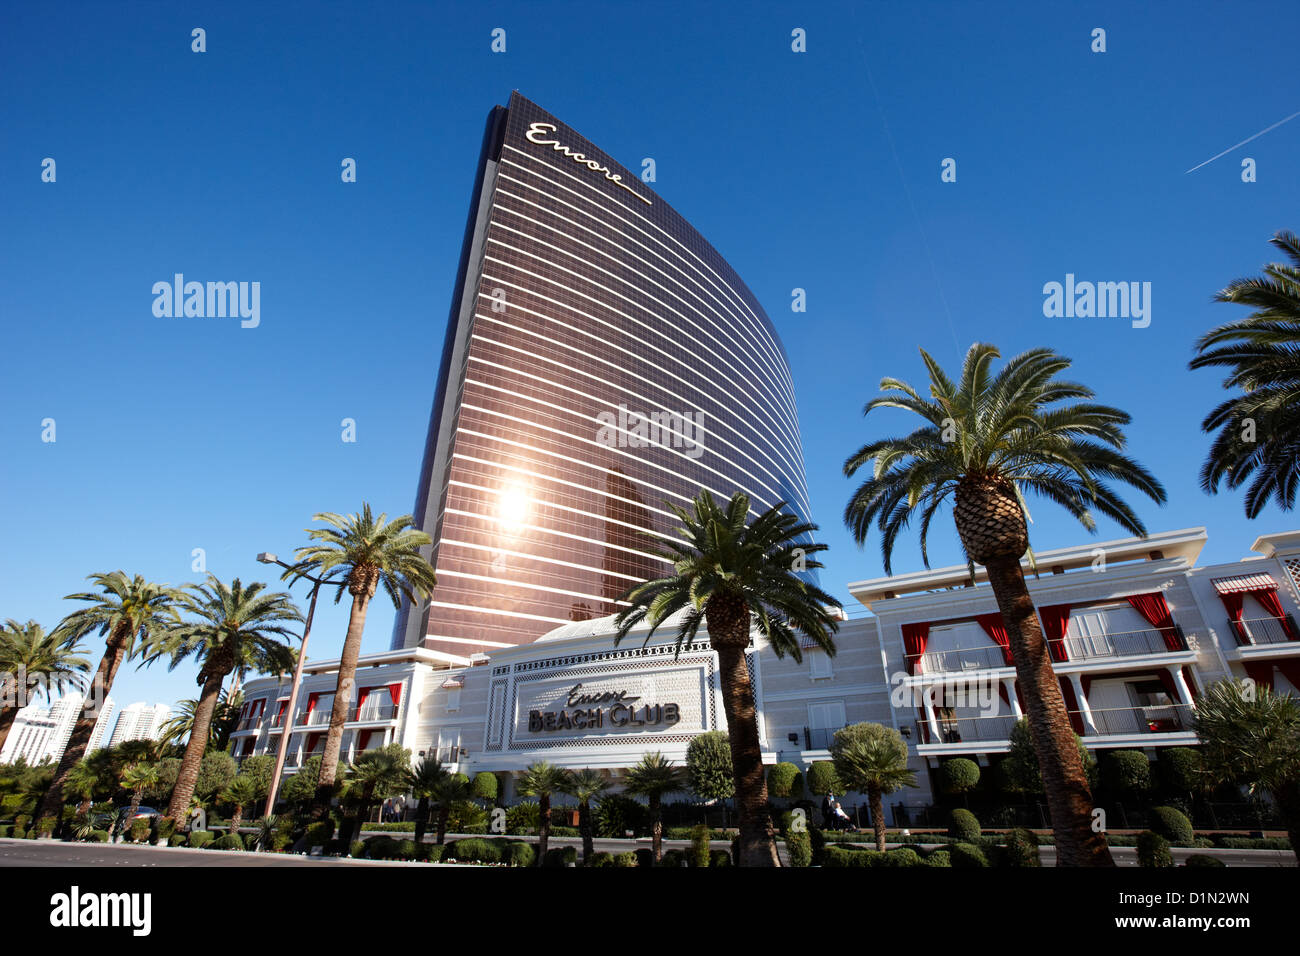 the encore resort and casino hotel and beach club Las Vegas Nevada USA - Stock Image